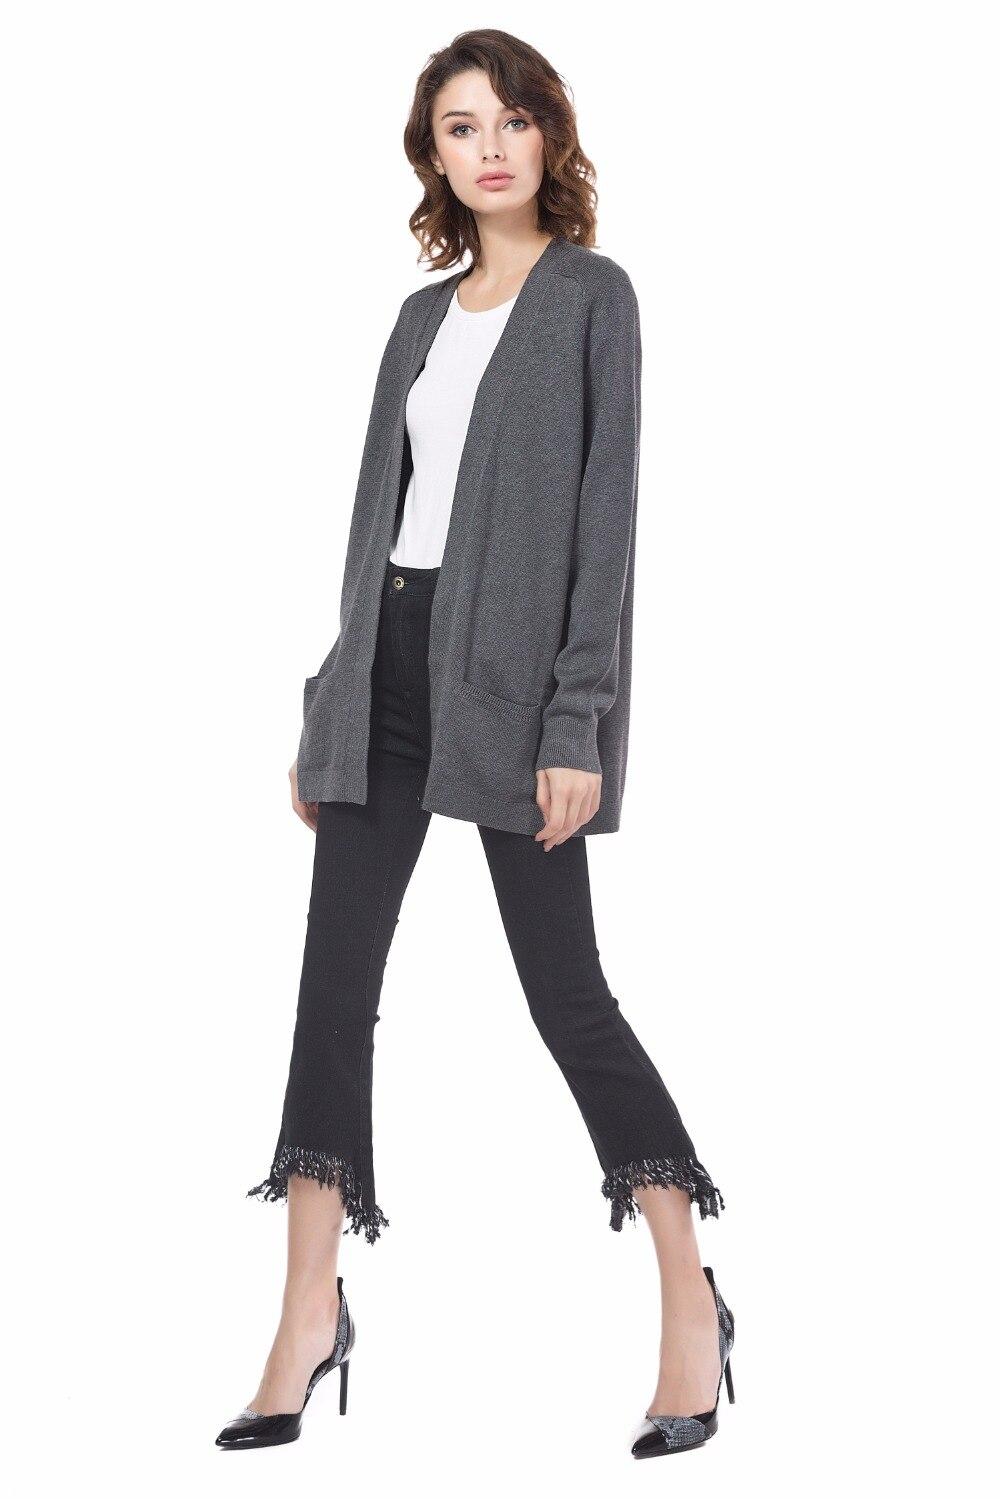 Aliexpress.com : Buy Knitbest 2016 Women Long Chunky Cardigan ...